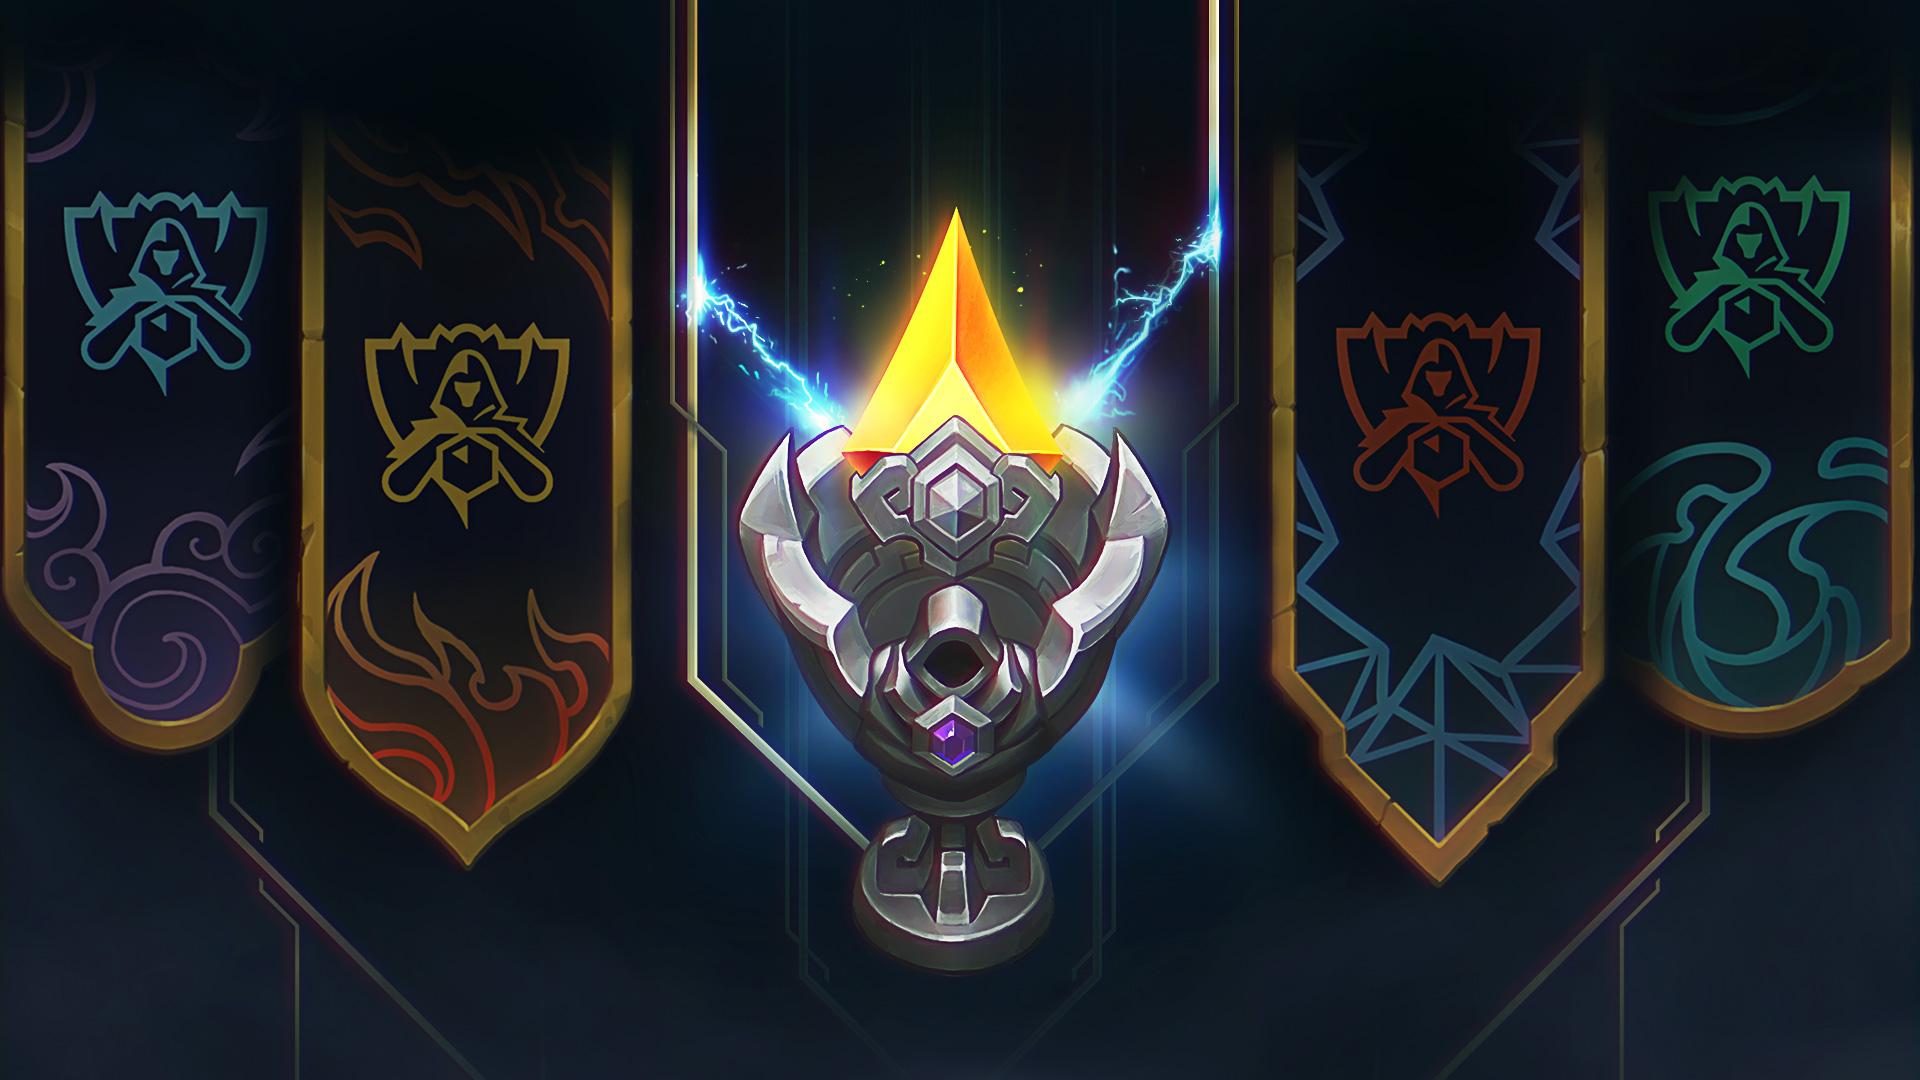 League of Legends Clash Worlds 2020 header